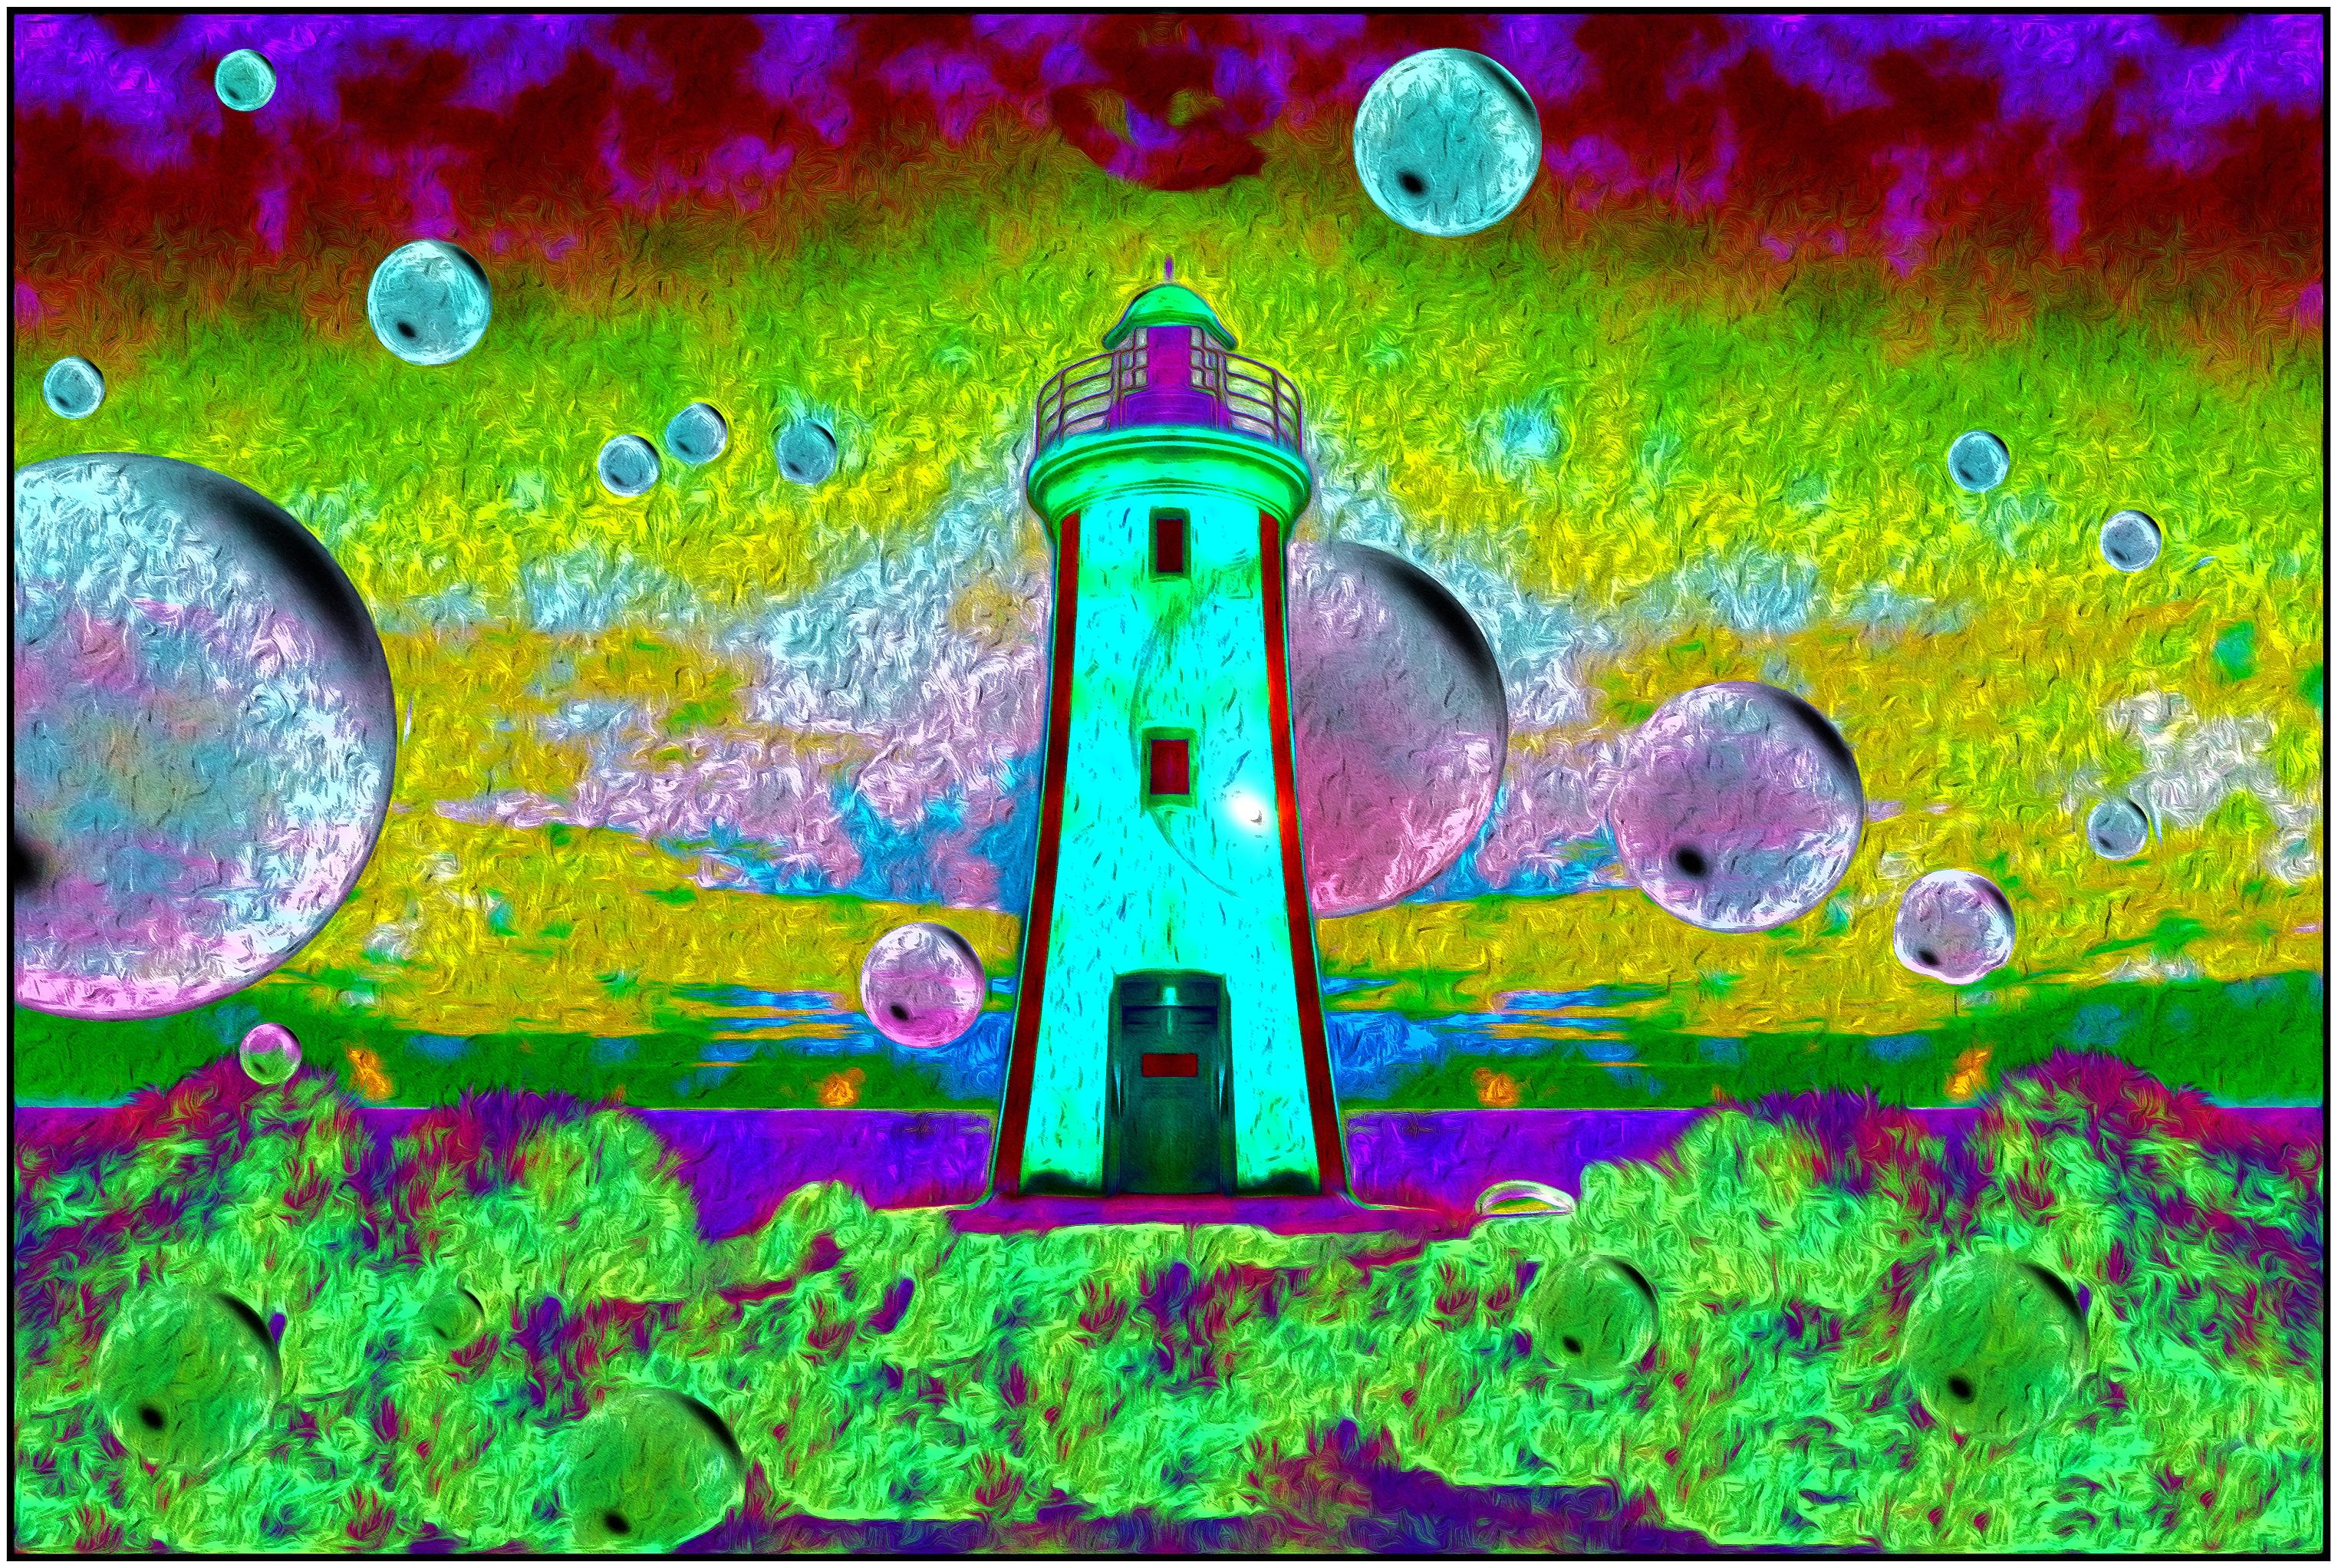 Wallpaper : illustration, Australia, Tasmania, ART, vibrant, colour ...